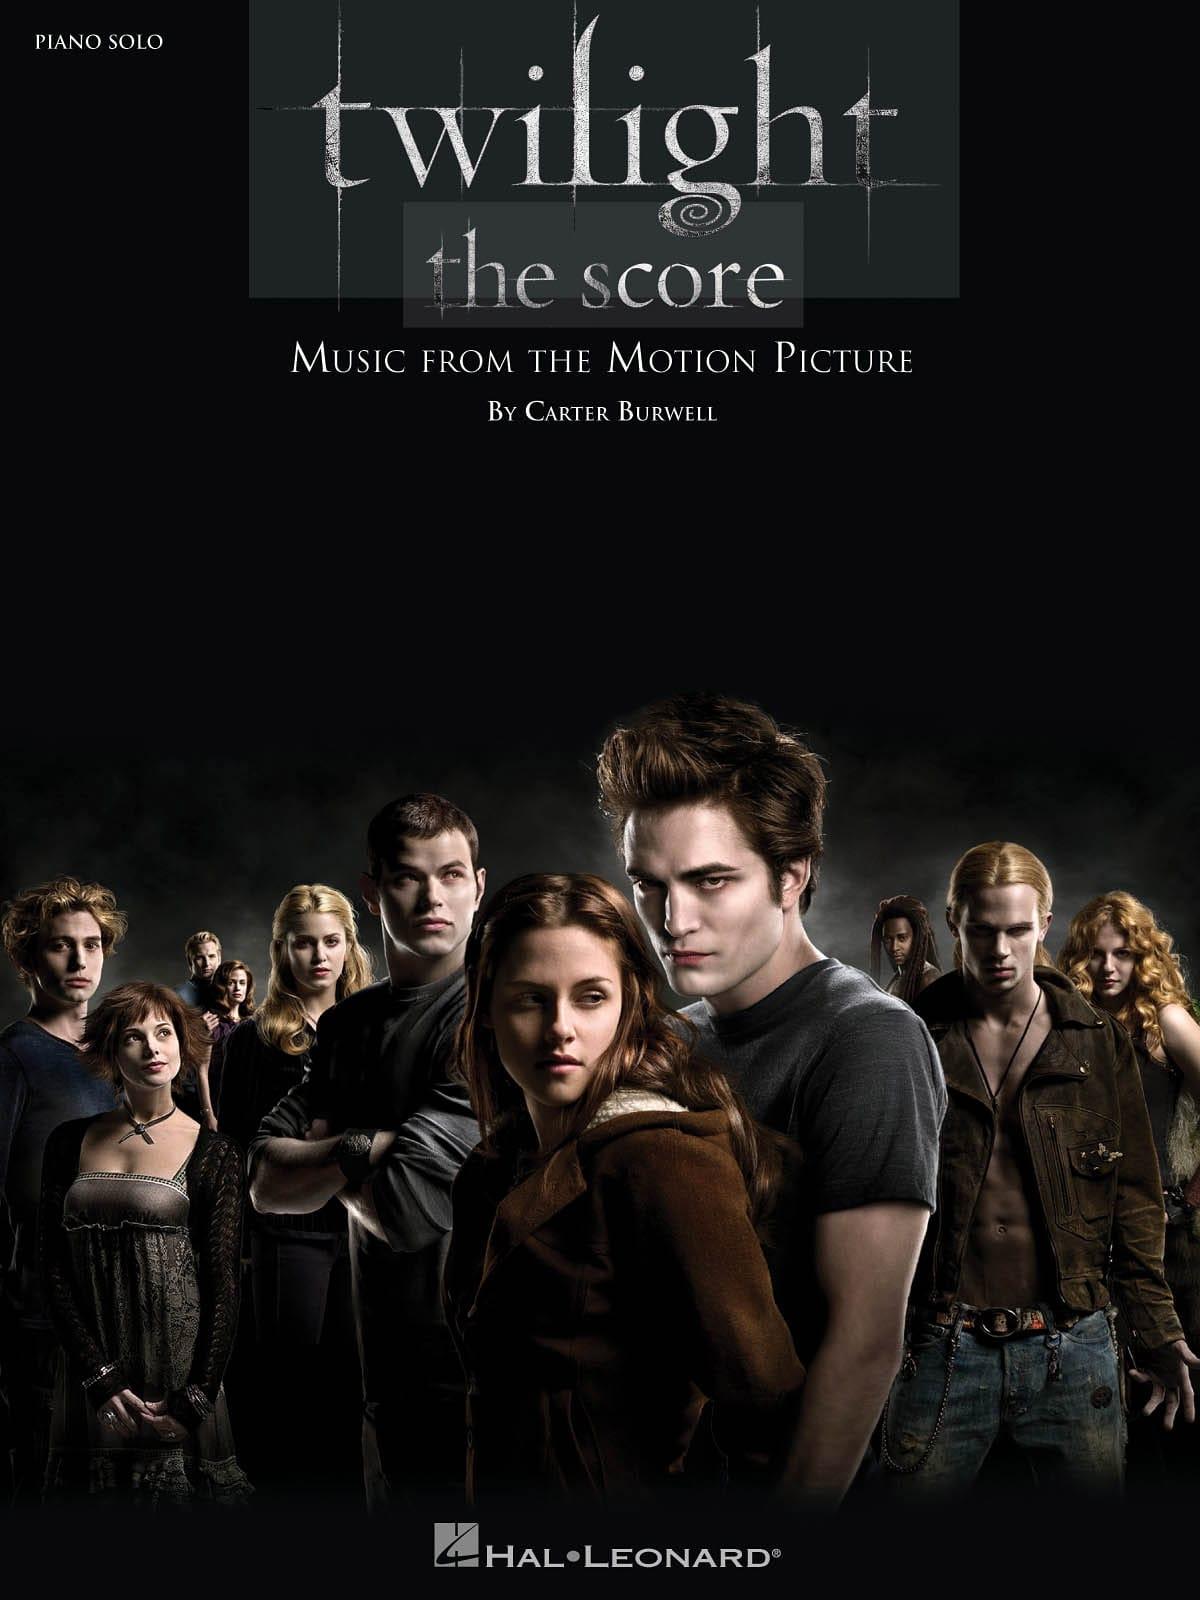 Carter Burwell - Twilight - The Score - Music Motion Picture - Partition - di-arezzo.com